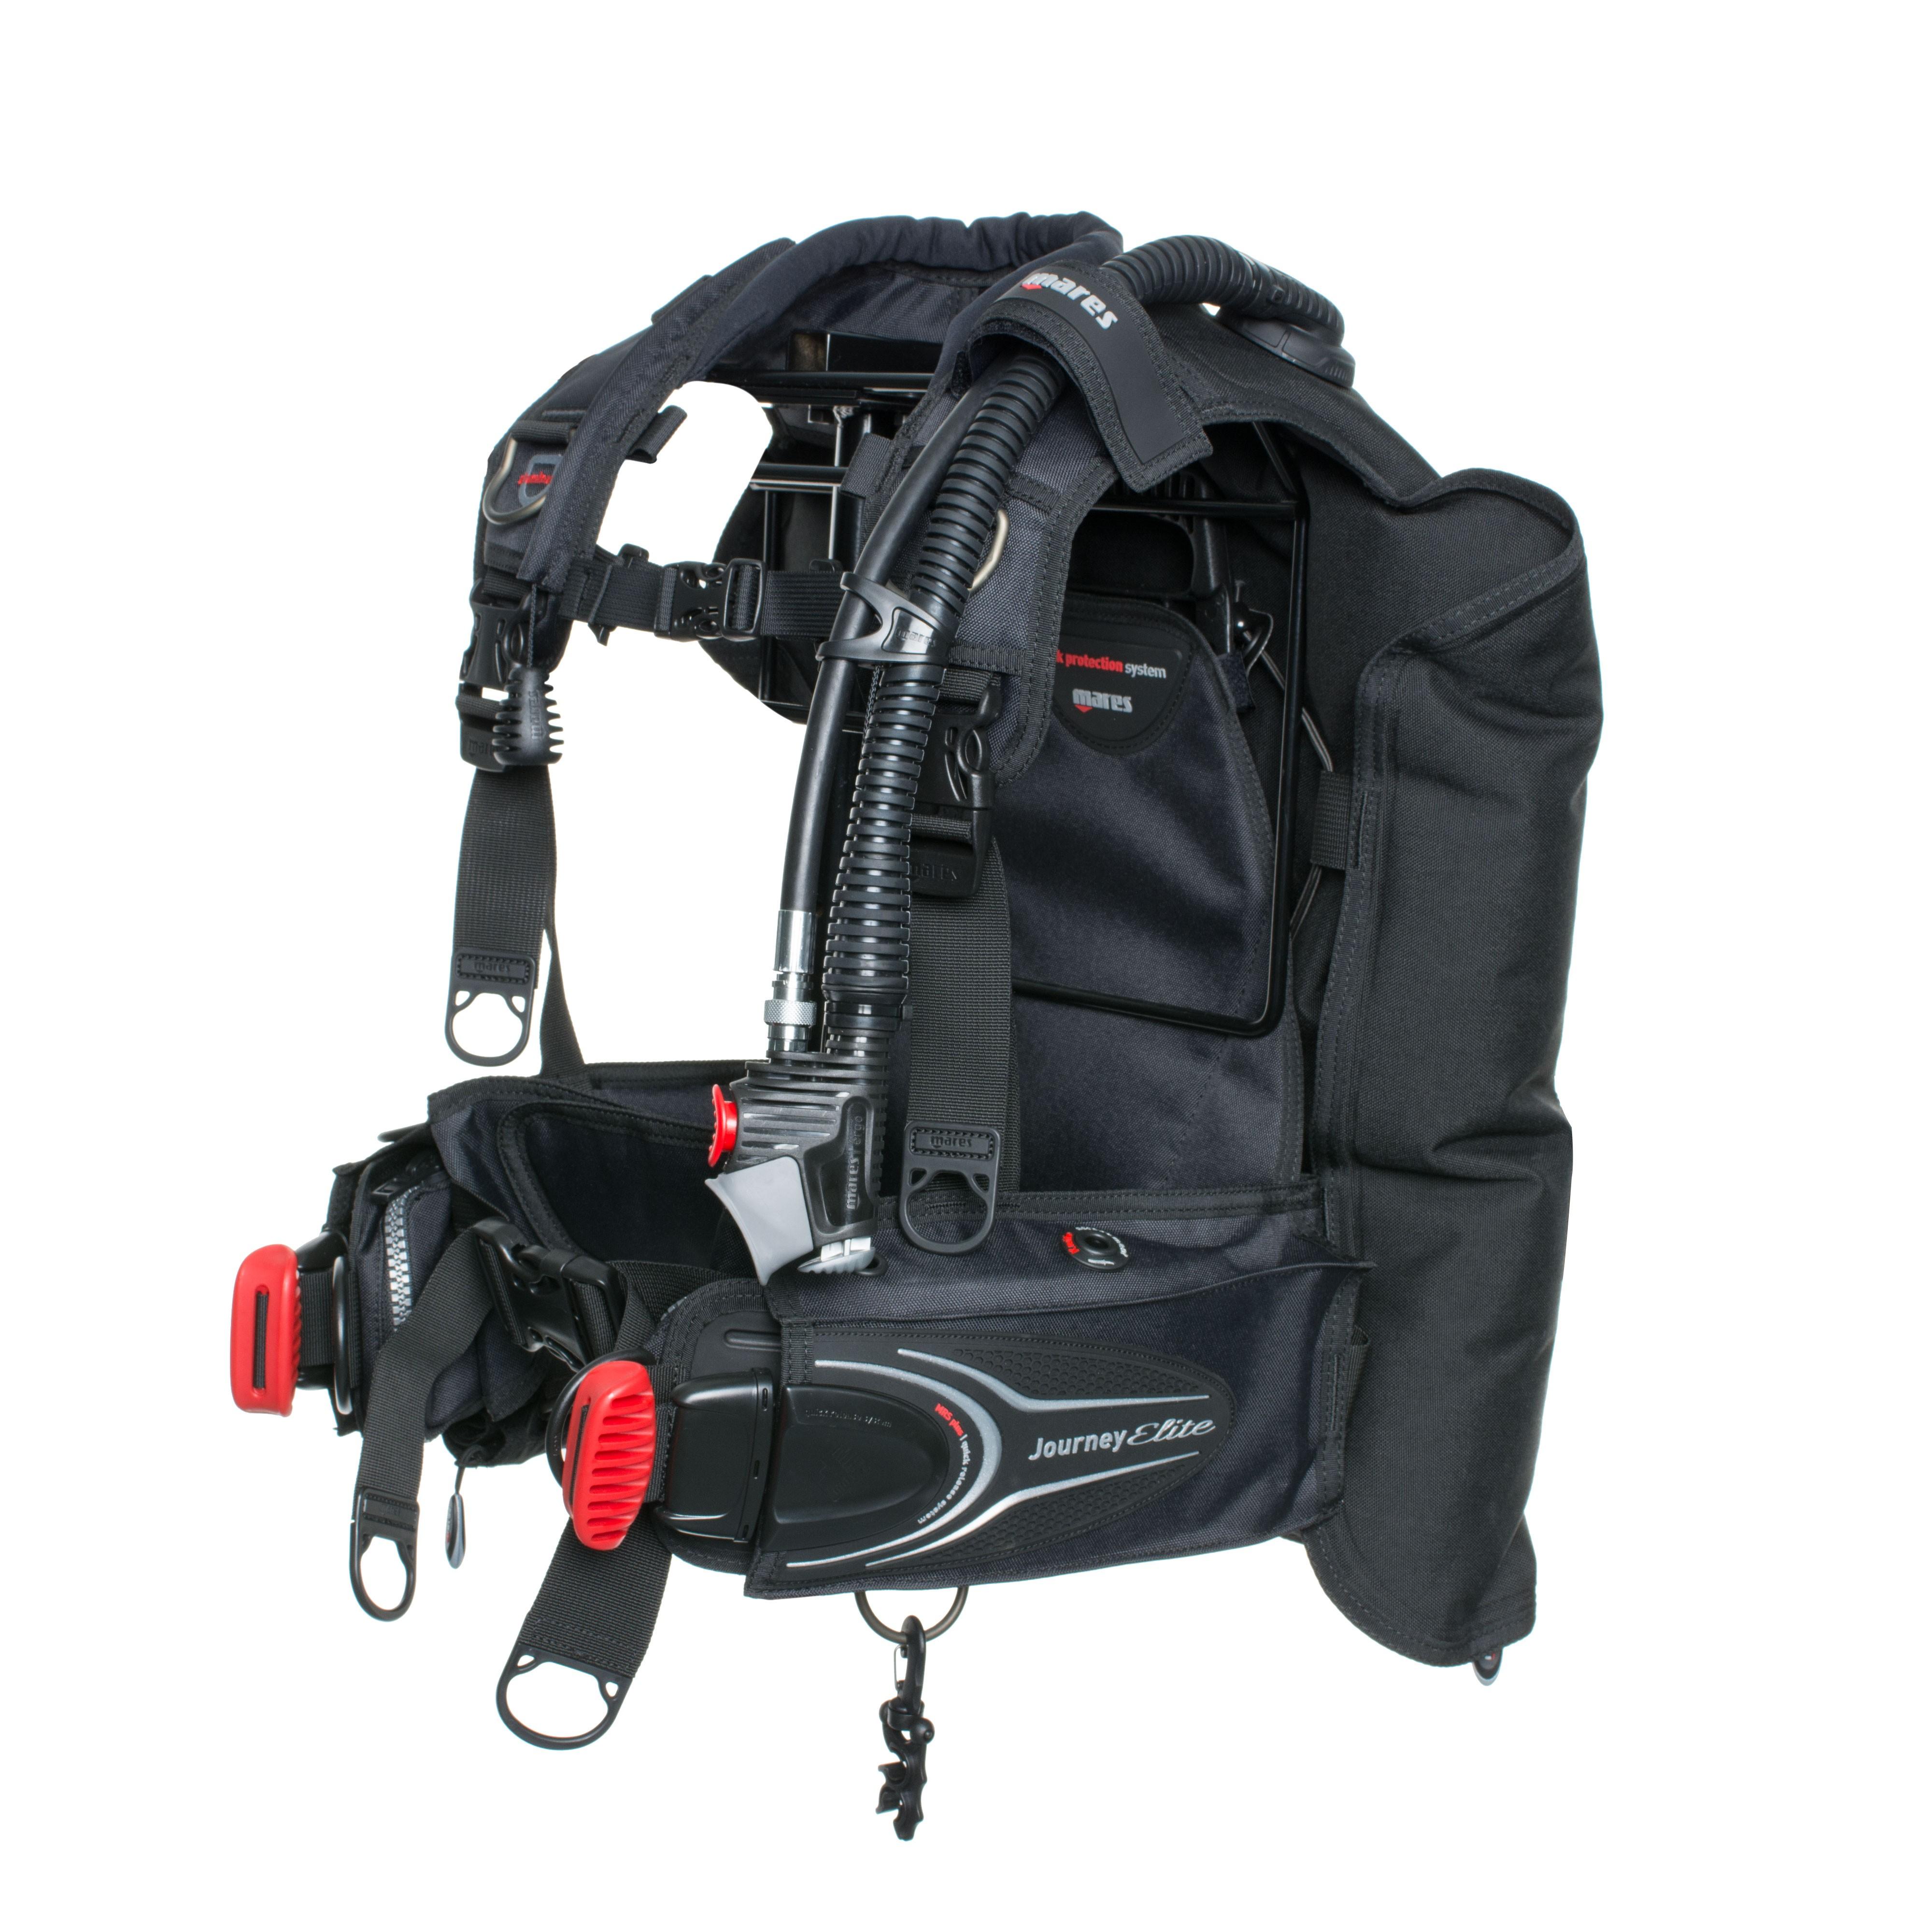 Mares Journey Elite Scuba Gear Package